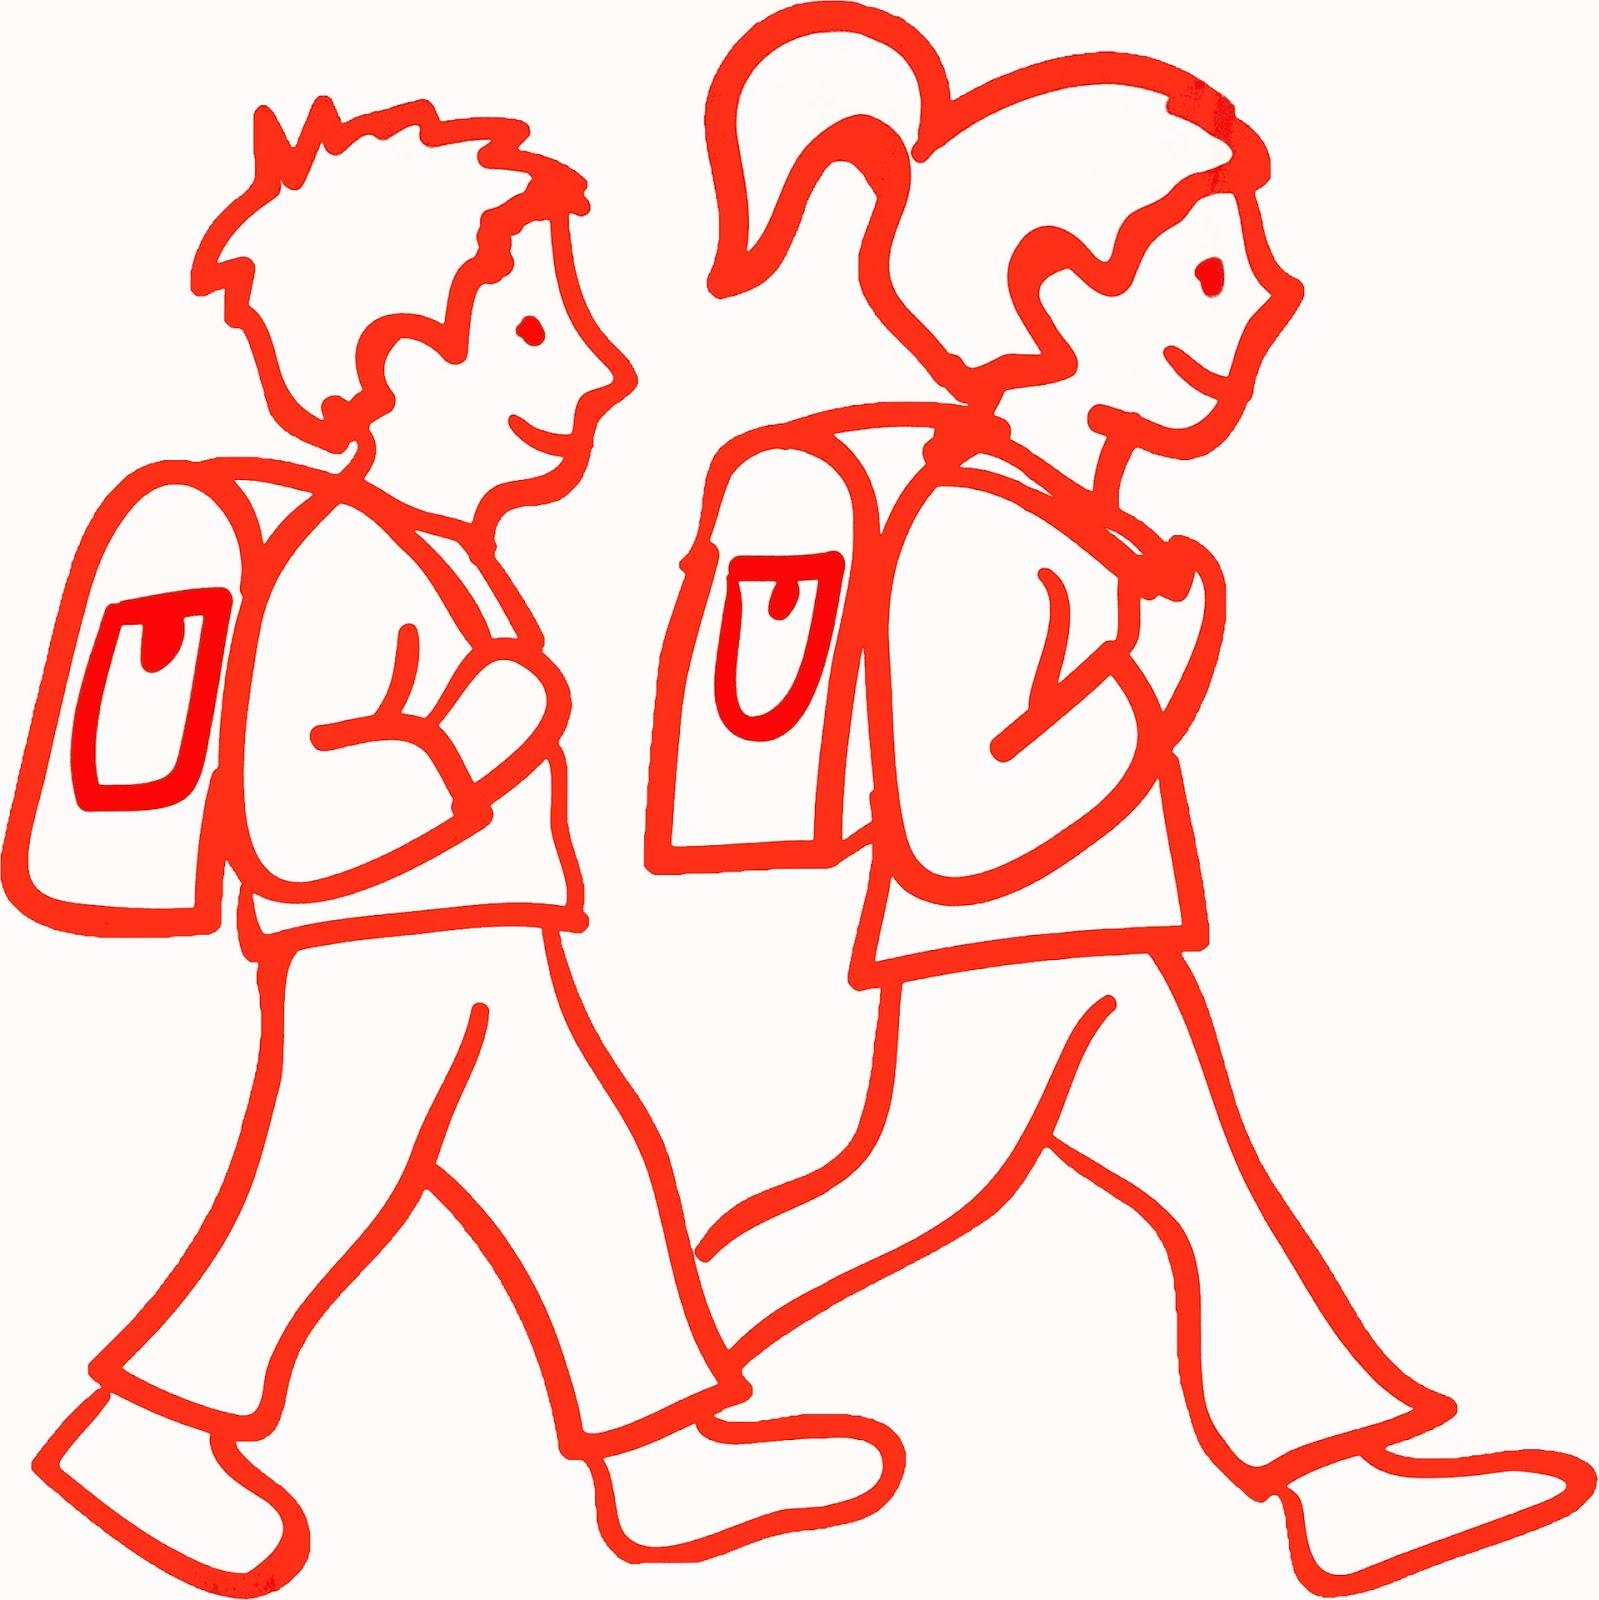 69491 School free clipart.